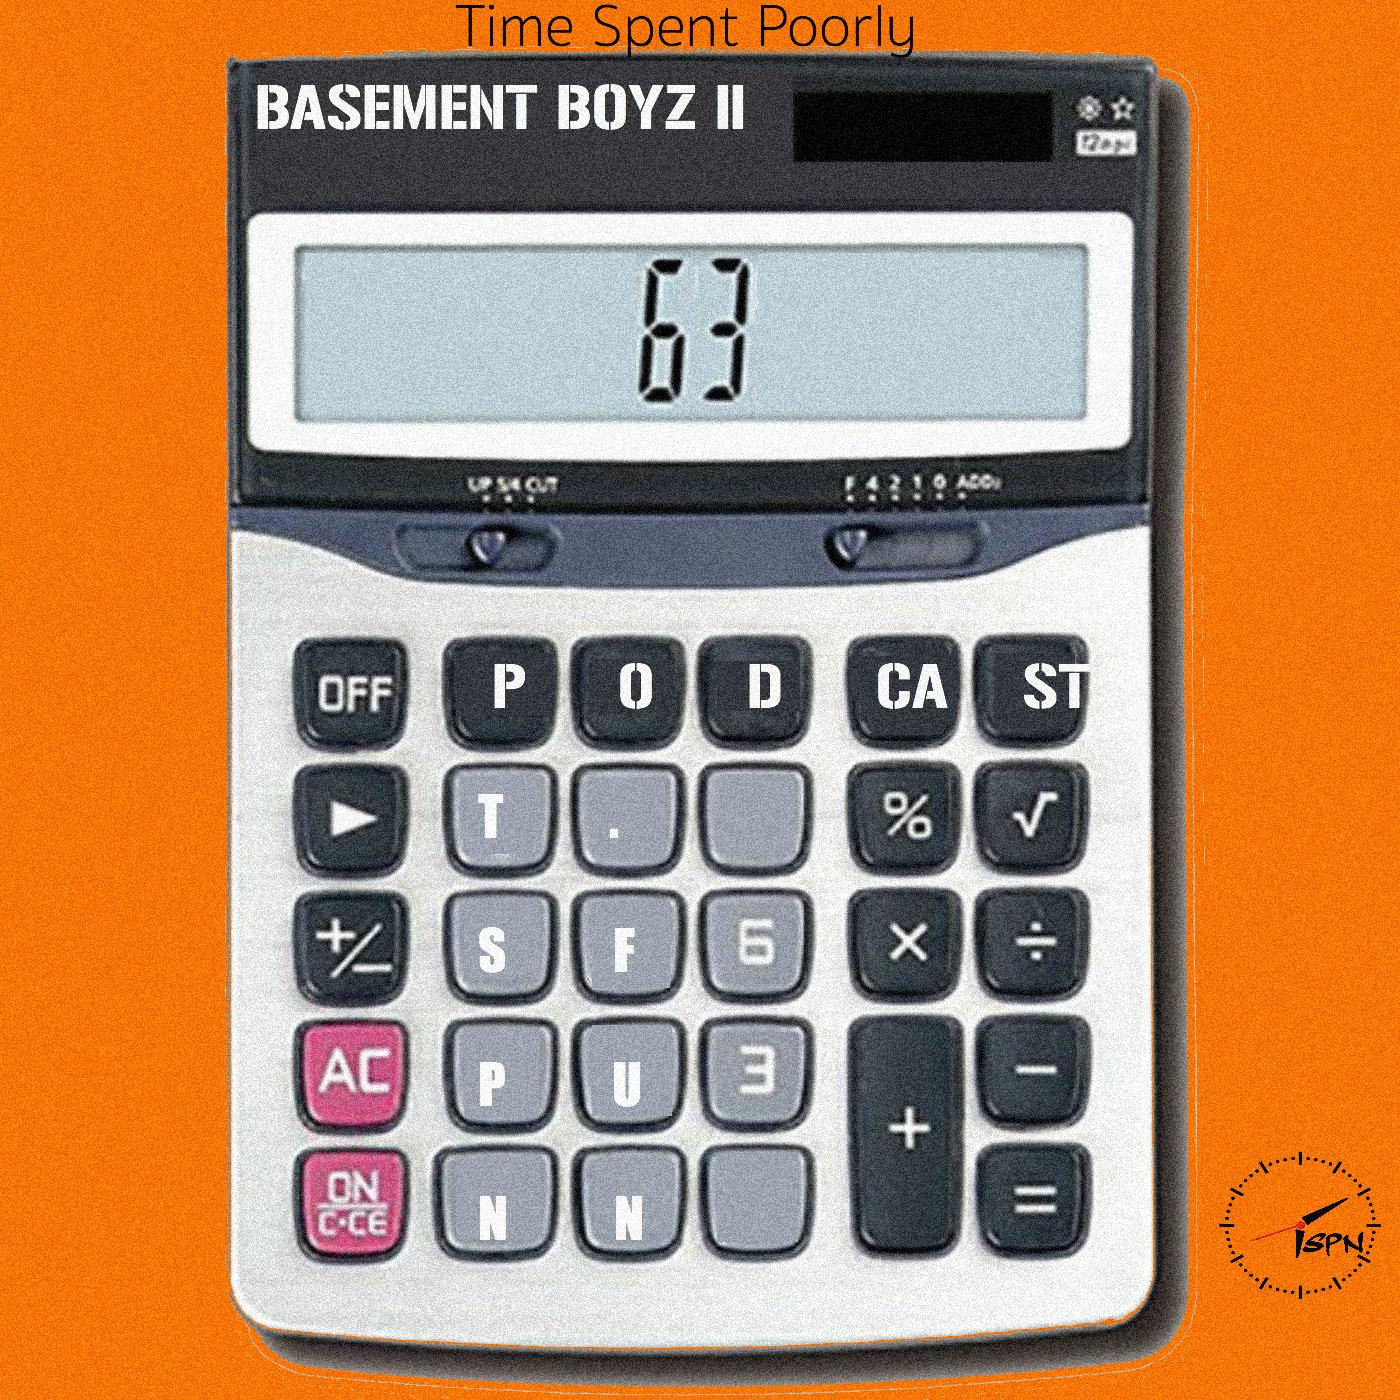 Basement Boyz II: Ep – 63 – Weighing In